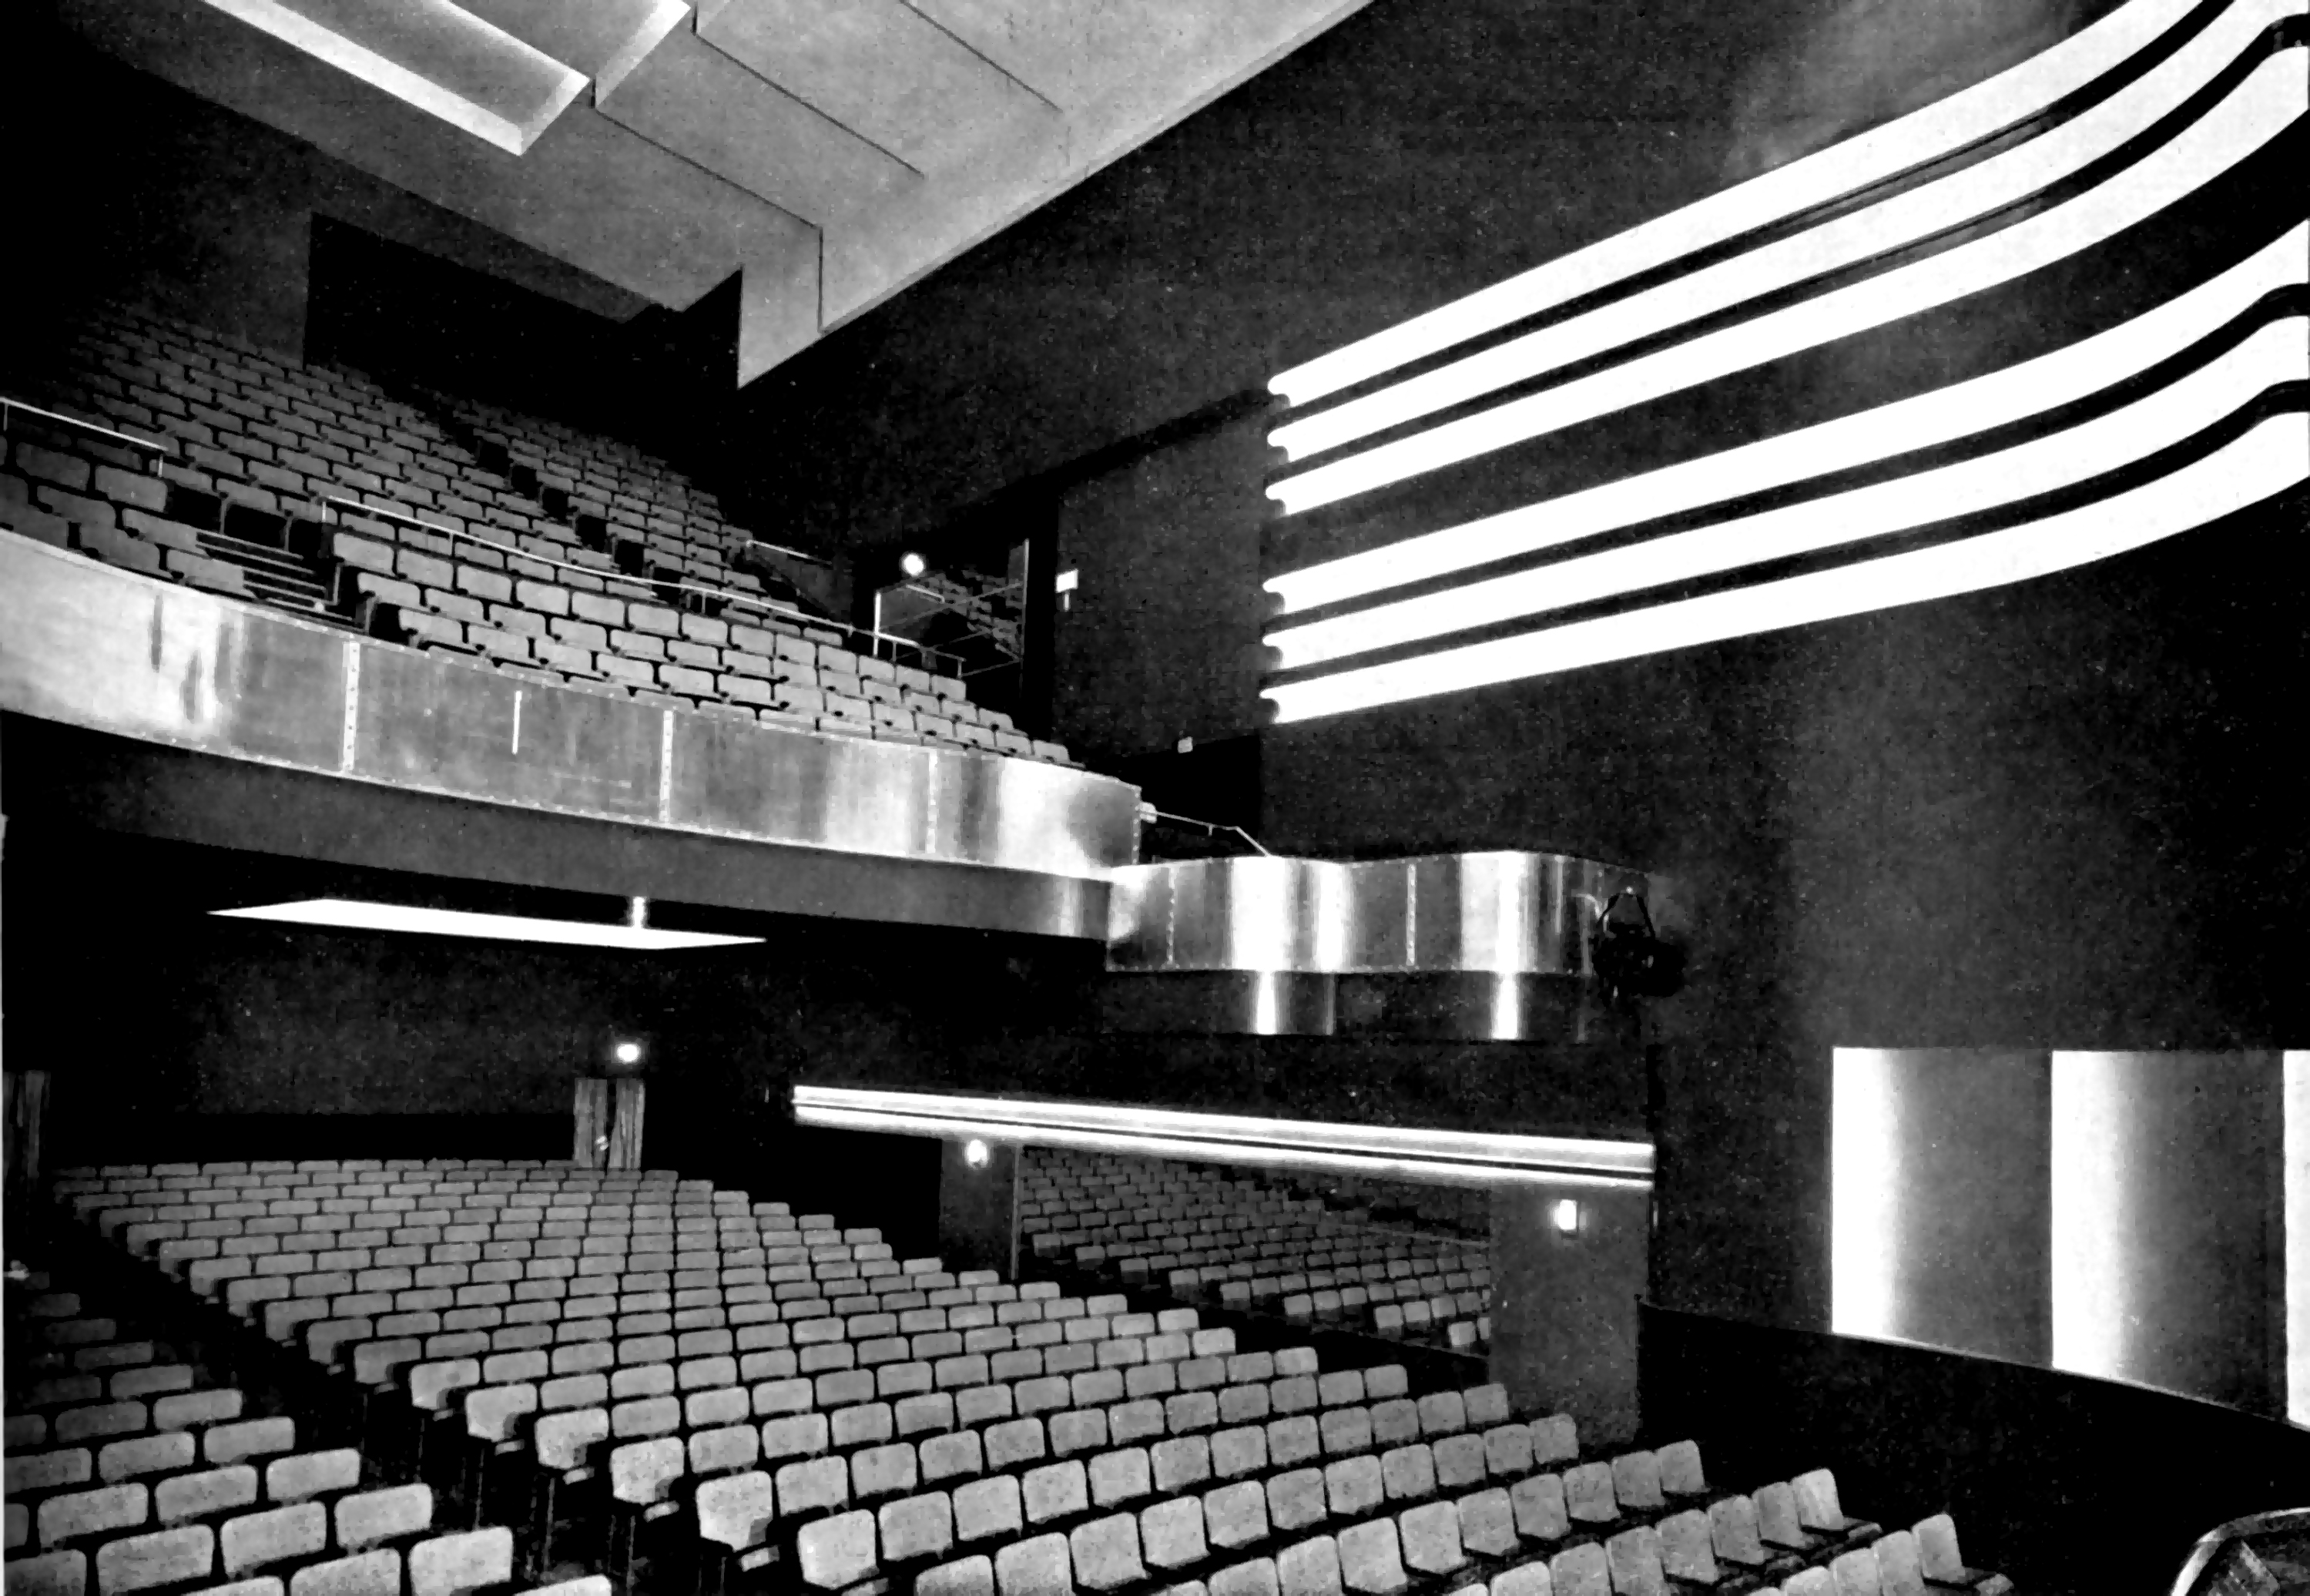 Teatro cine f garo madrid 1931 urban idade for Teatro figaro adolfo marsillach